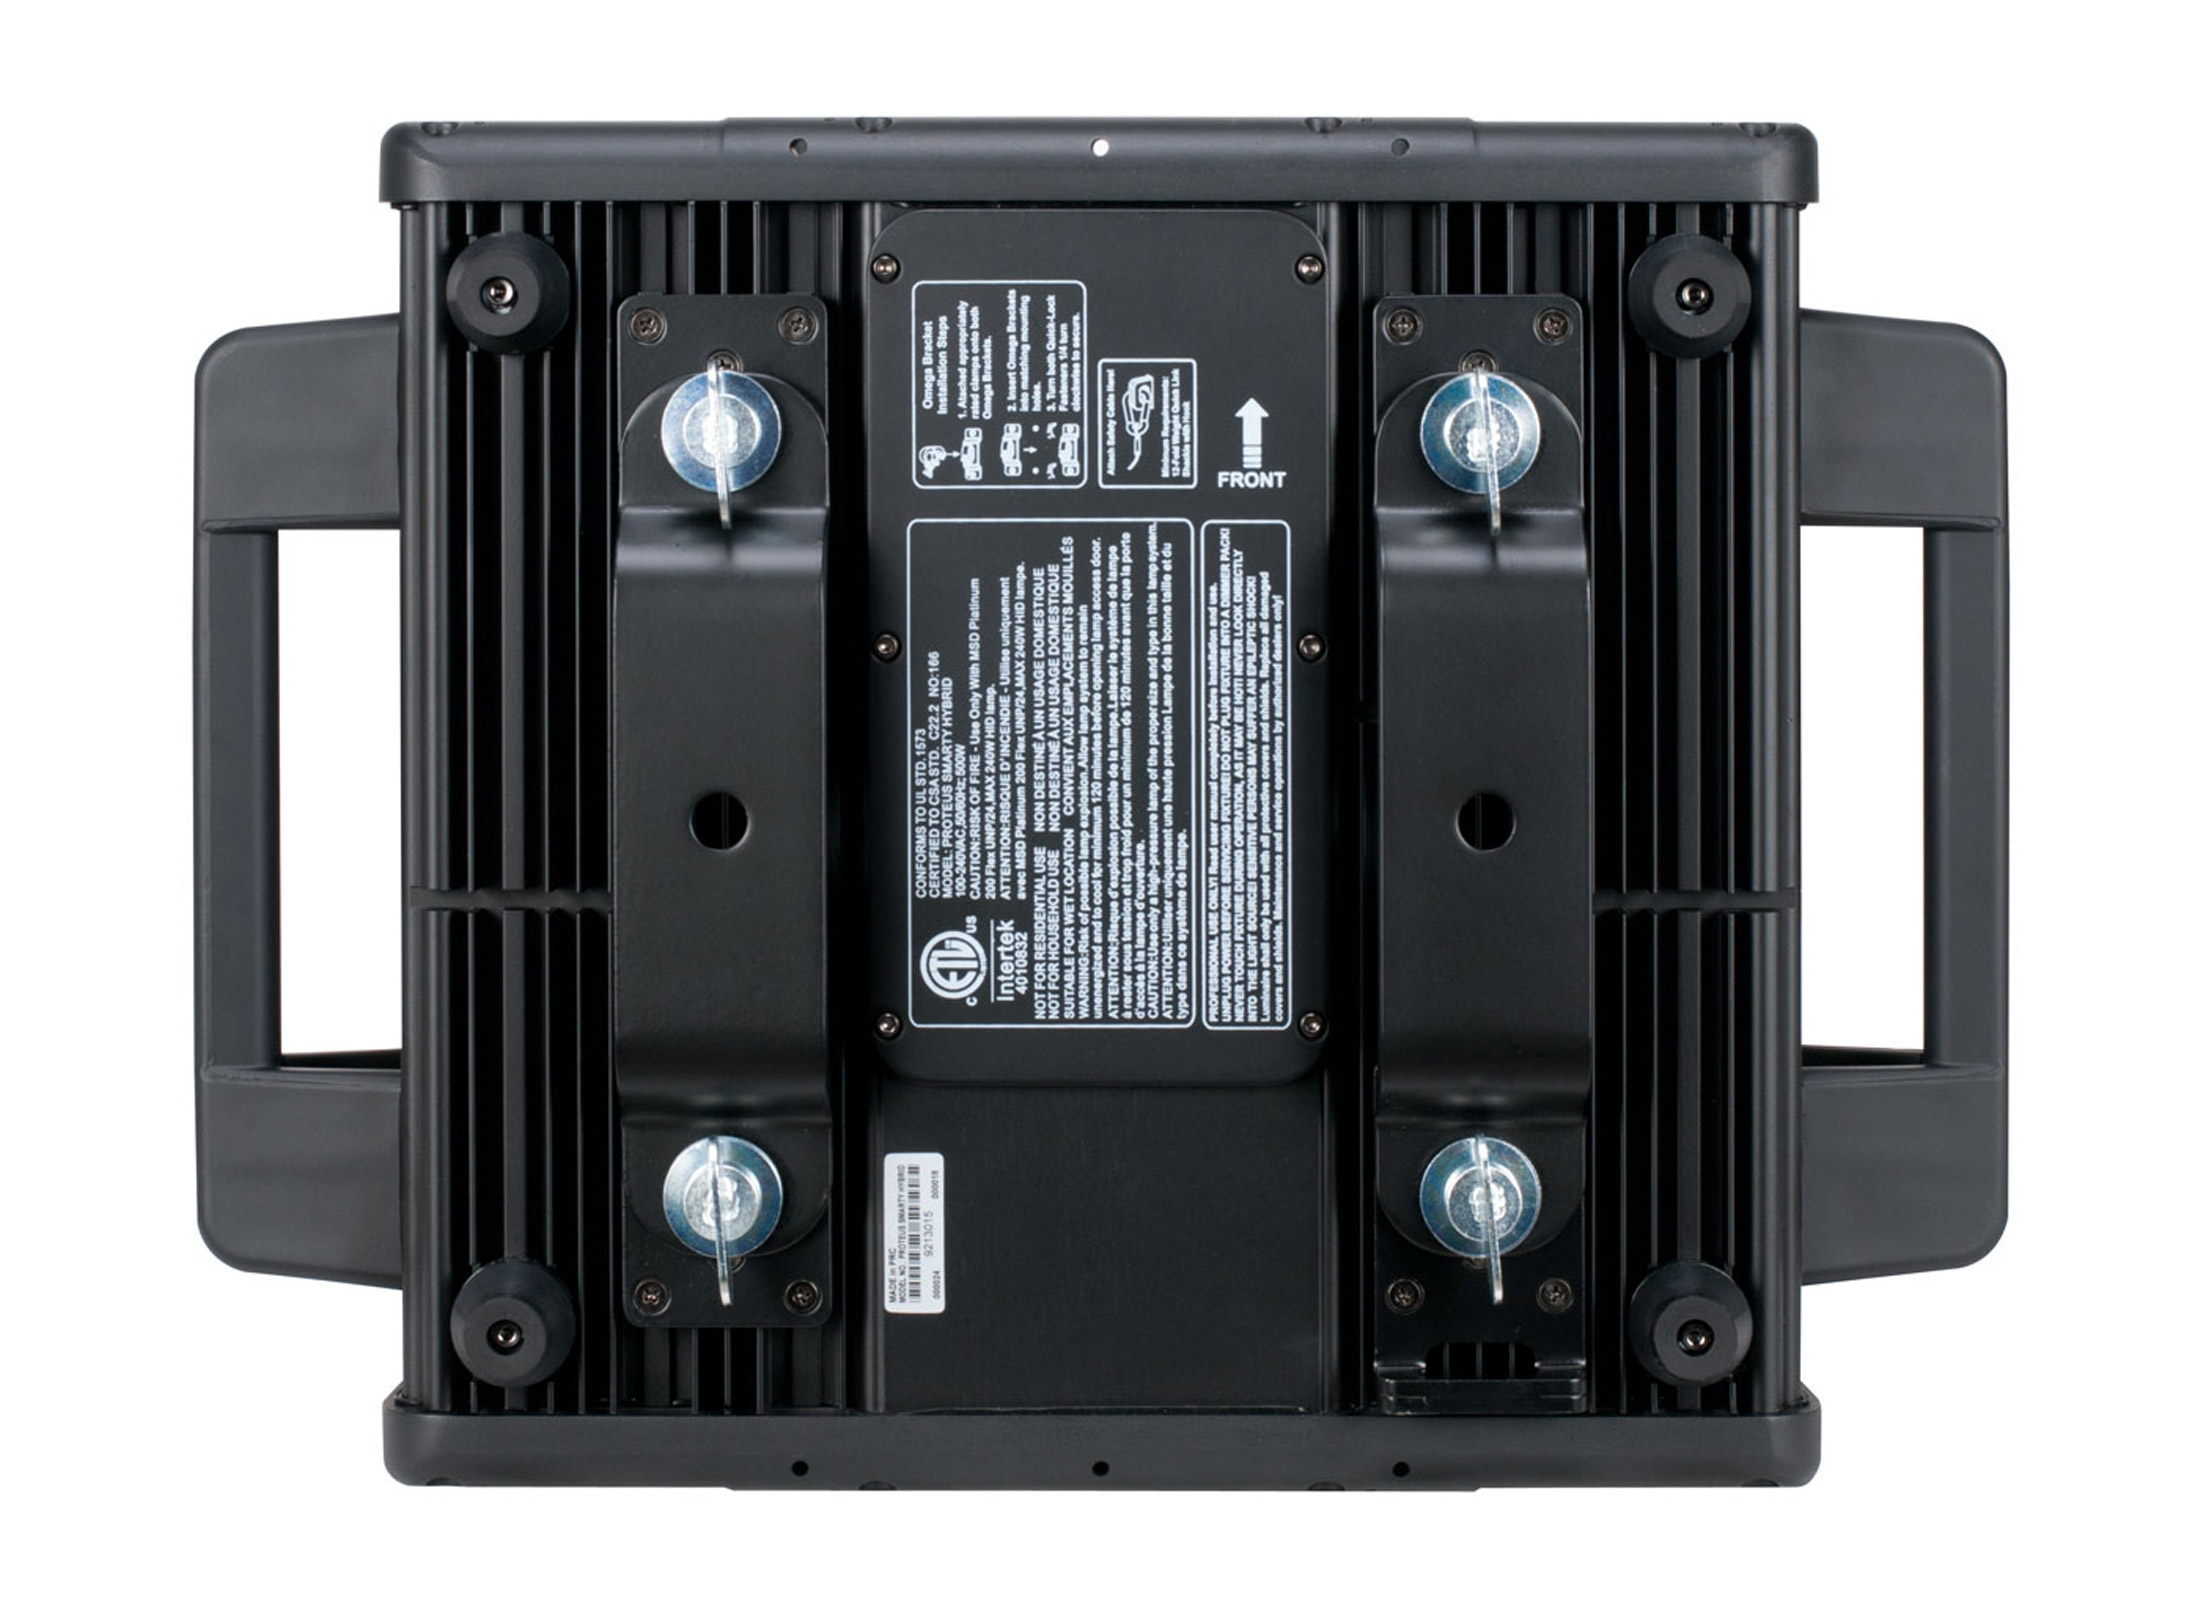 Elation Proteus Smarty Hybrid Outdoor Moving Head, Platinum Flex 200,  8000K, 1°-33° Zoom, IP65, DMX, RDM, Master/Slave